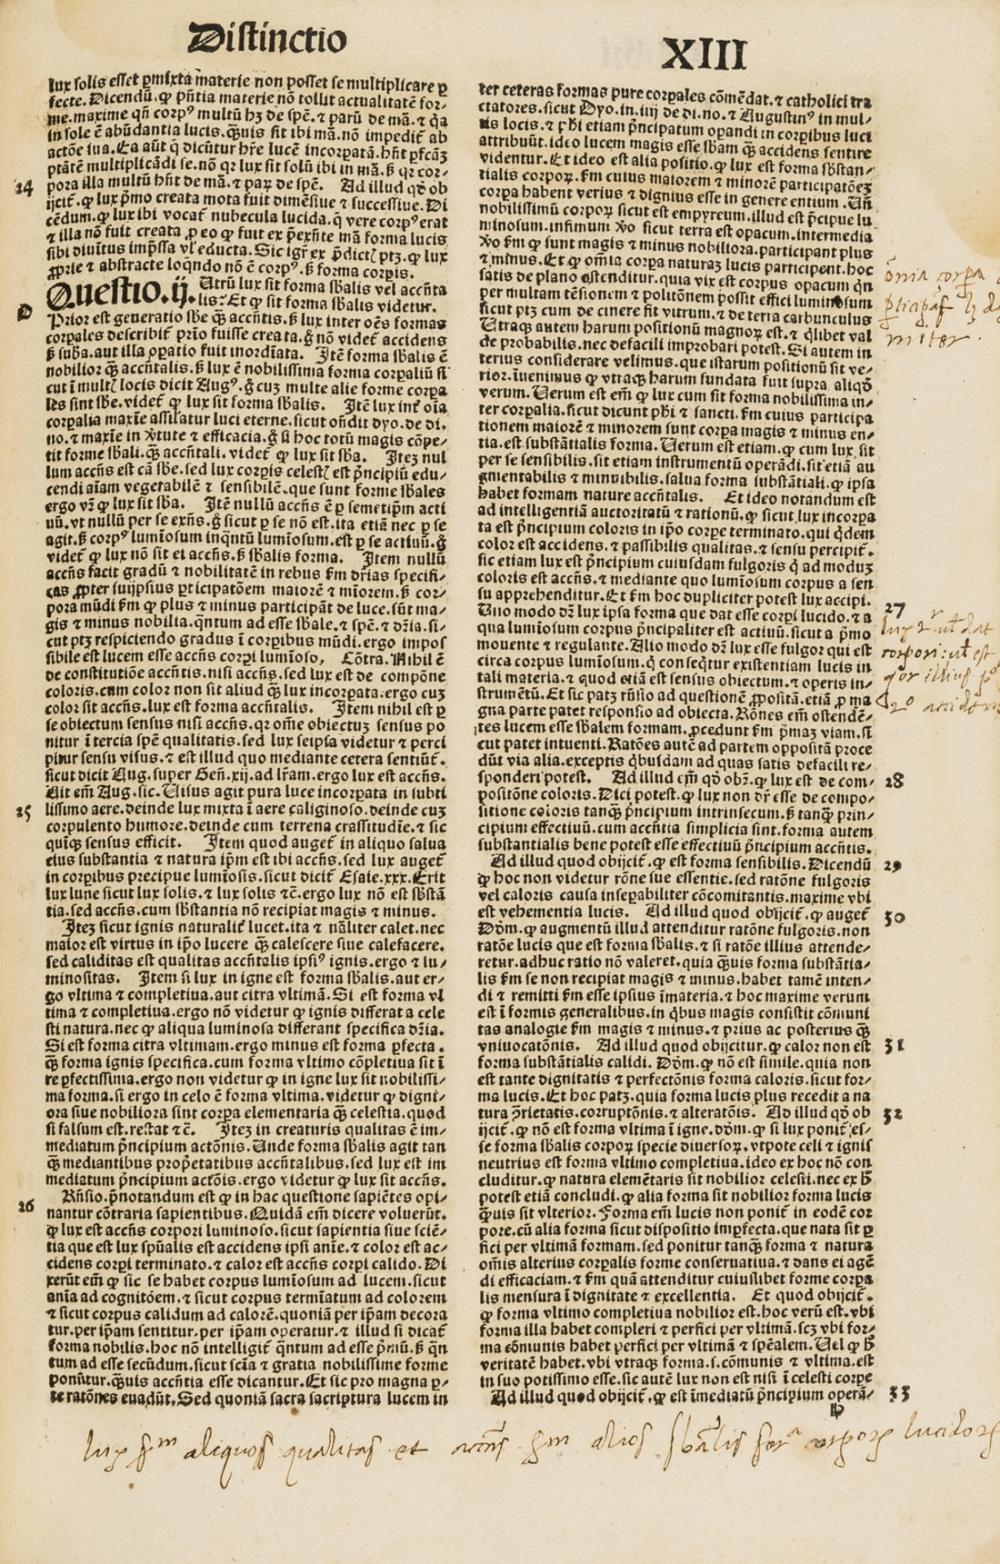 Lombardus (Petrus, Bishop of Paris) Sententiarum libri IV, Commentary by St Bonaventura and others, Tabula by Johannes Beckenhaub, Nuremberg, Anton Koberger, 1500.